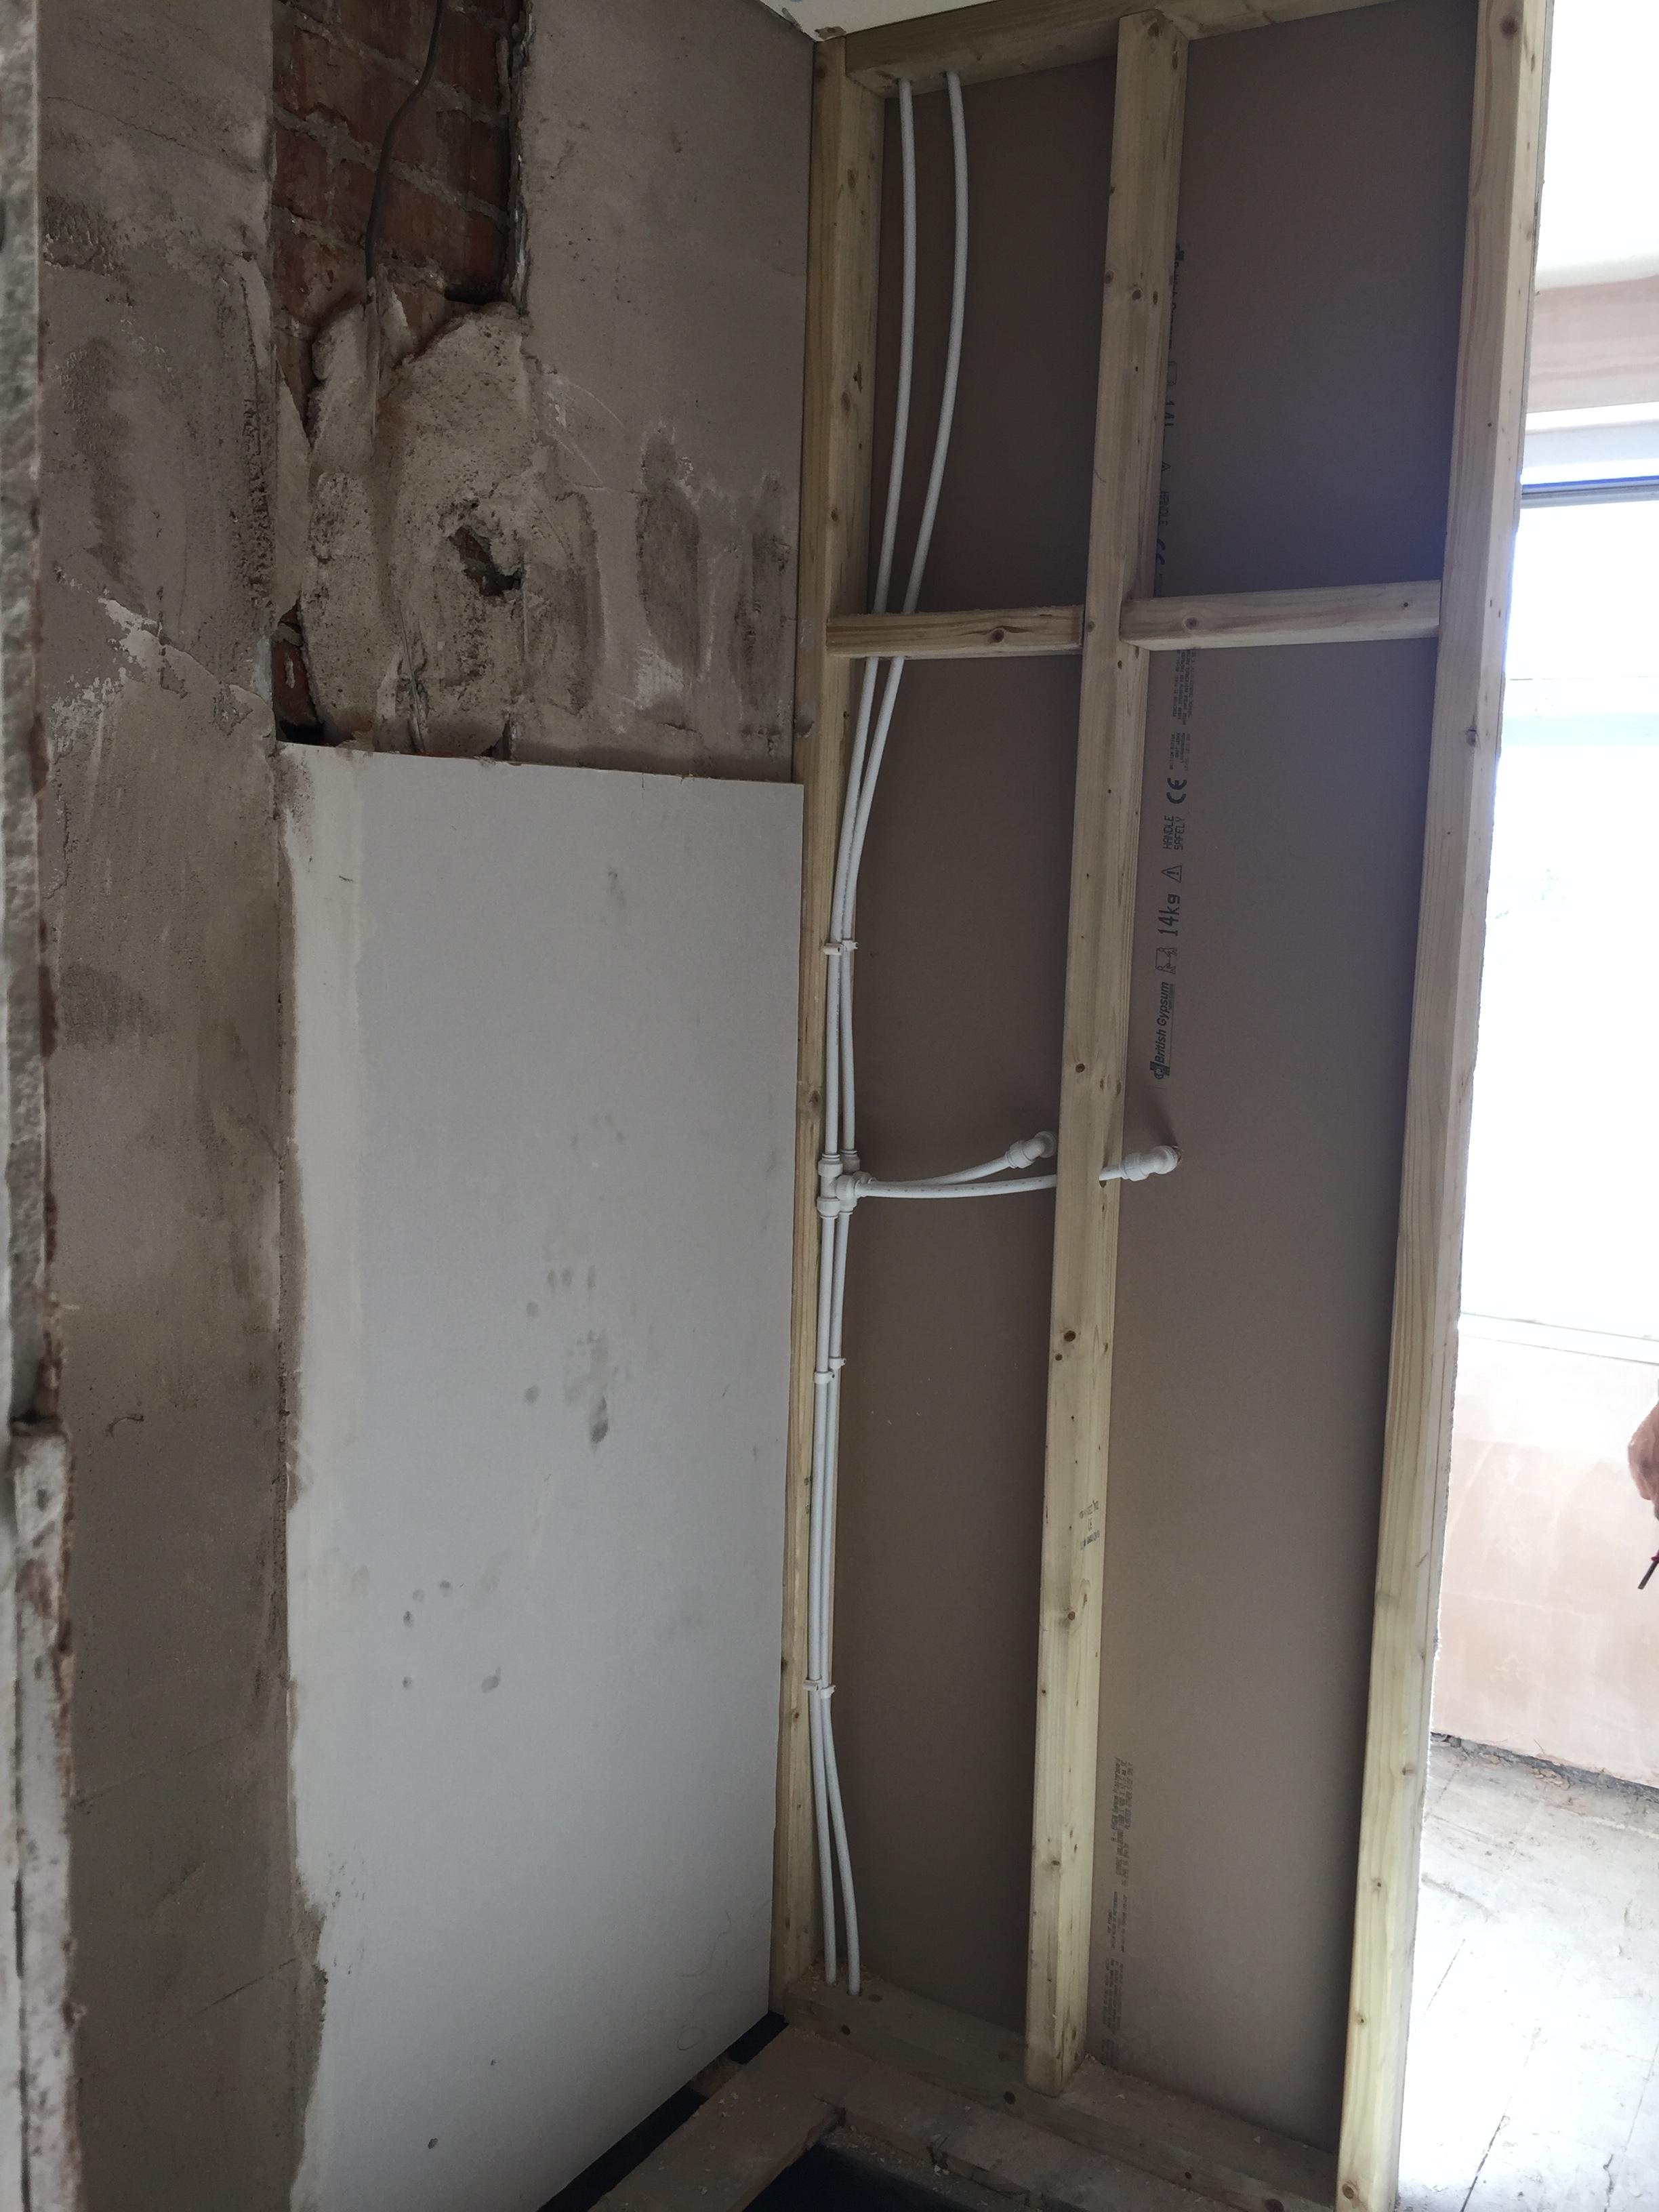 Remodelled room, new shower area